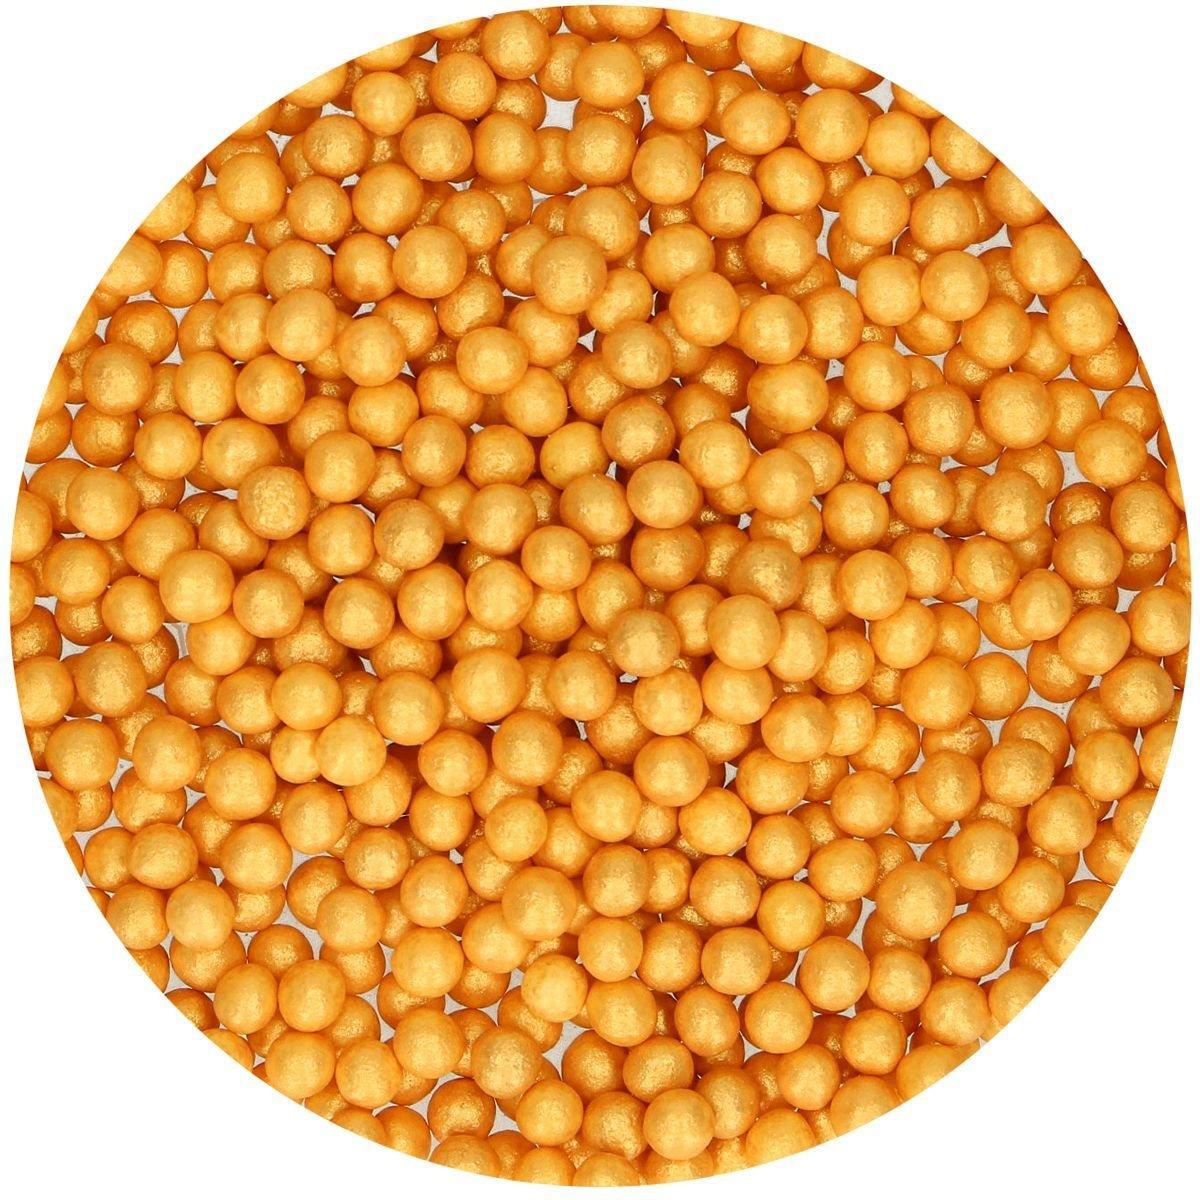 FunCakes Soft Sugarballs 4mm -GOLD 60g - Μαλακές Πέρλες Ζάχαρης - Χρυσό 60γρ